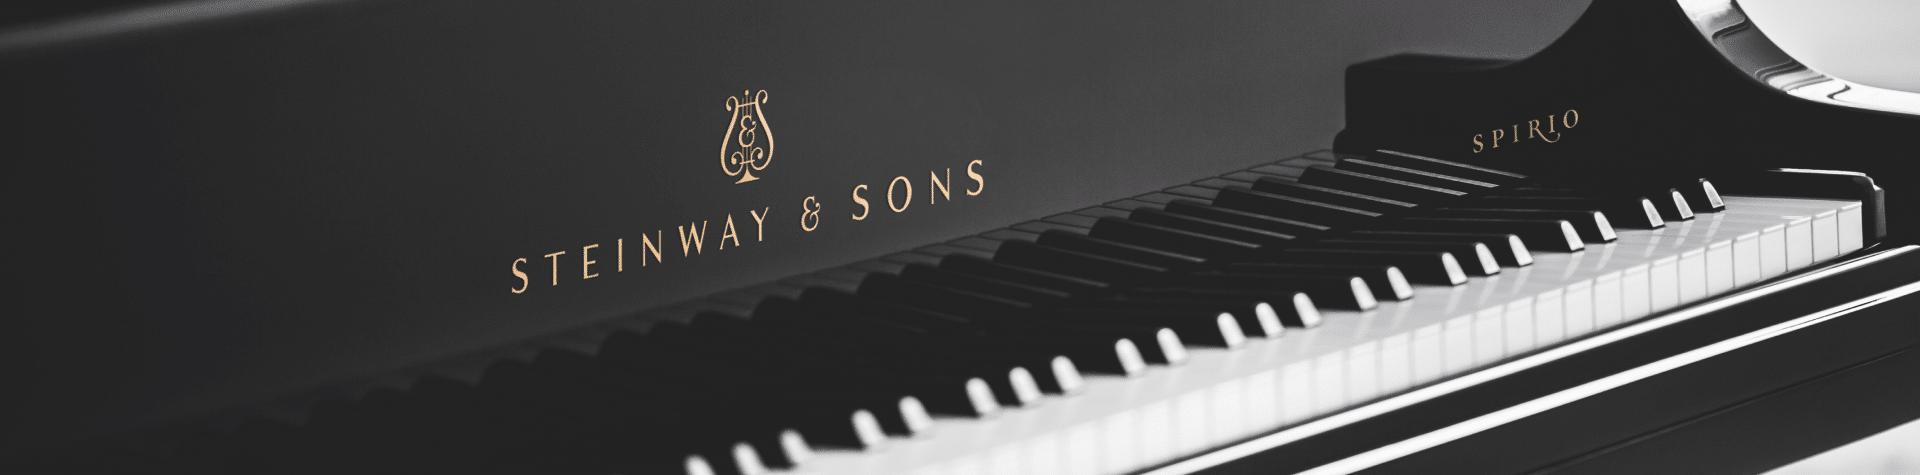 Steinway and sons digital marketing